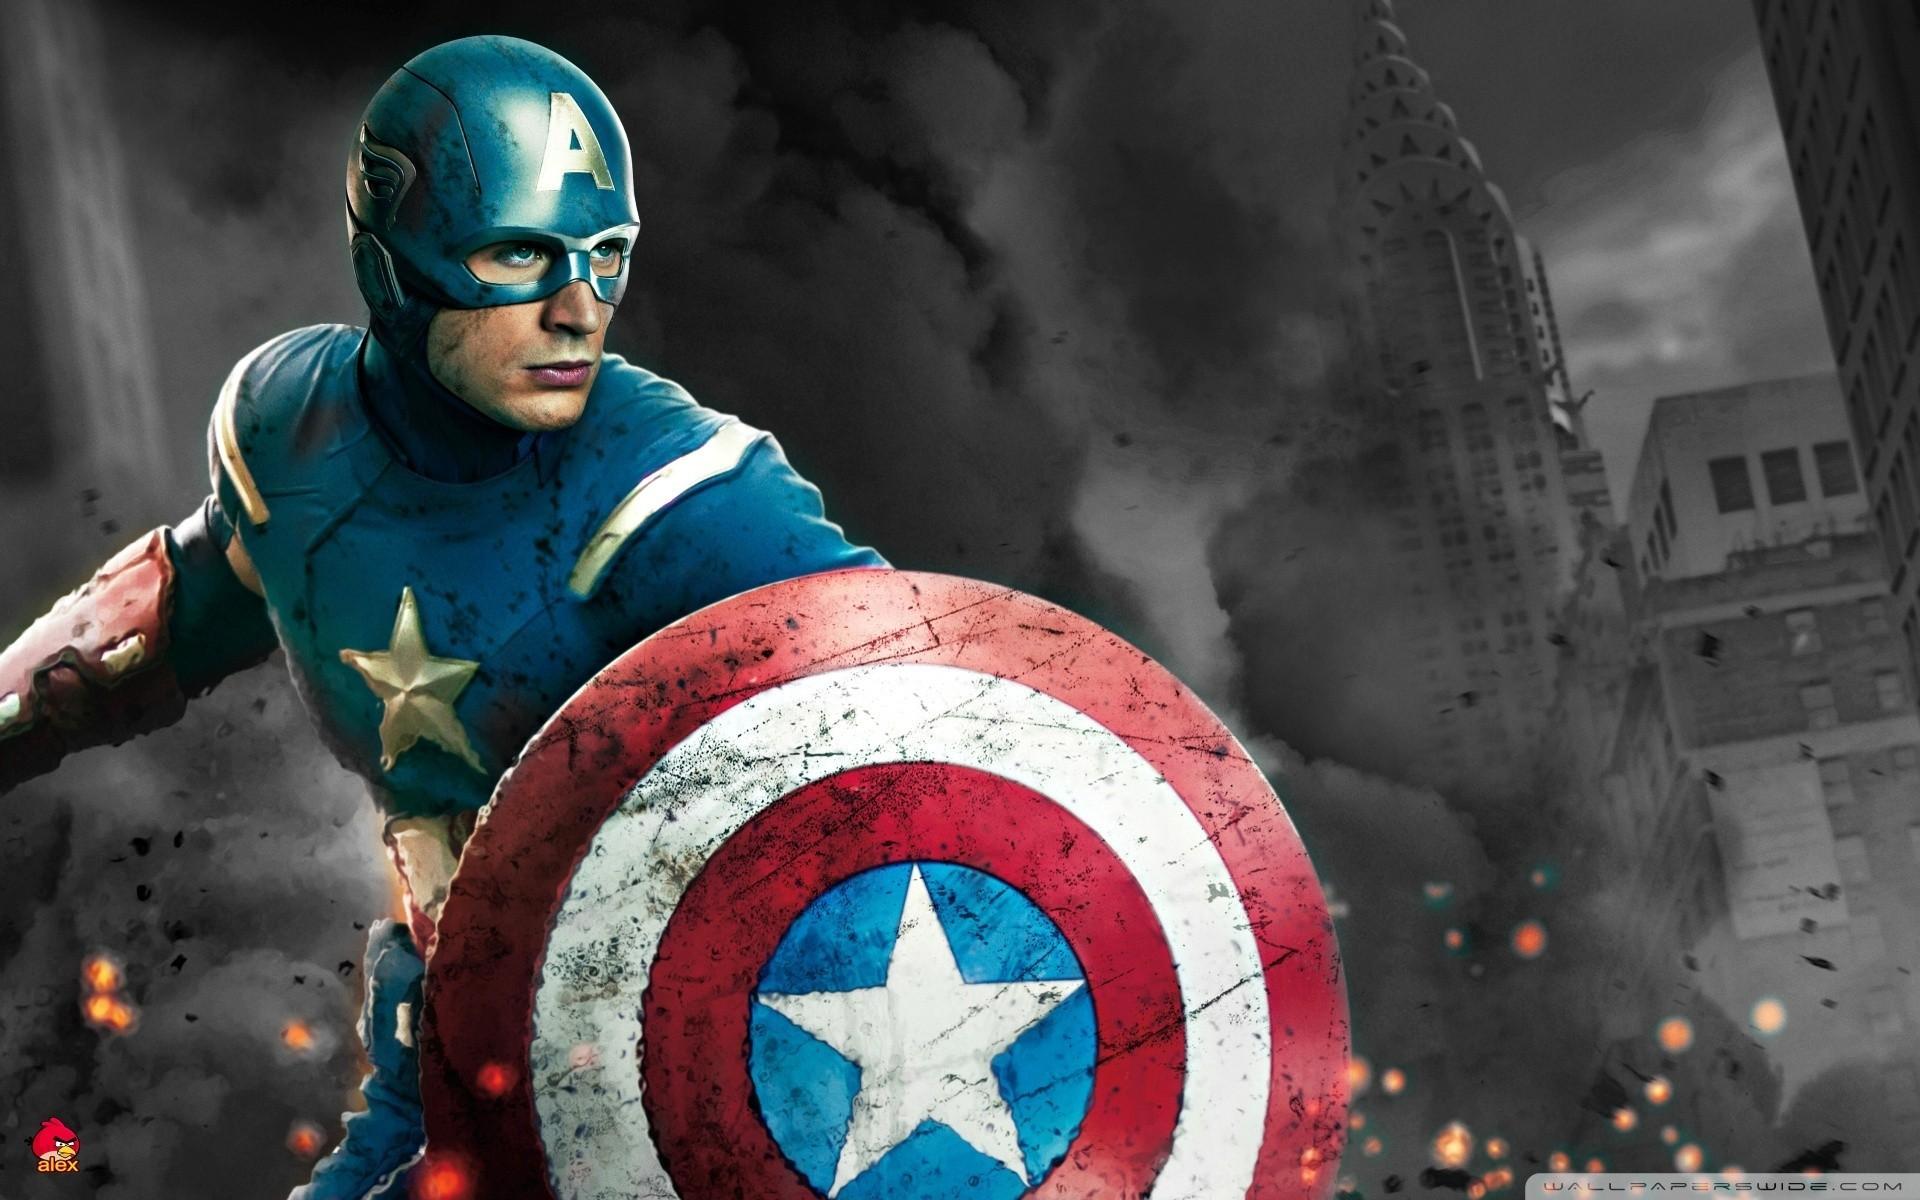 Res: 1920x1200, Captain America Chris Evans Avengers